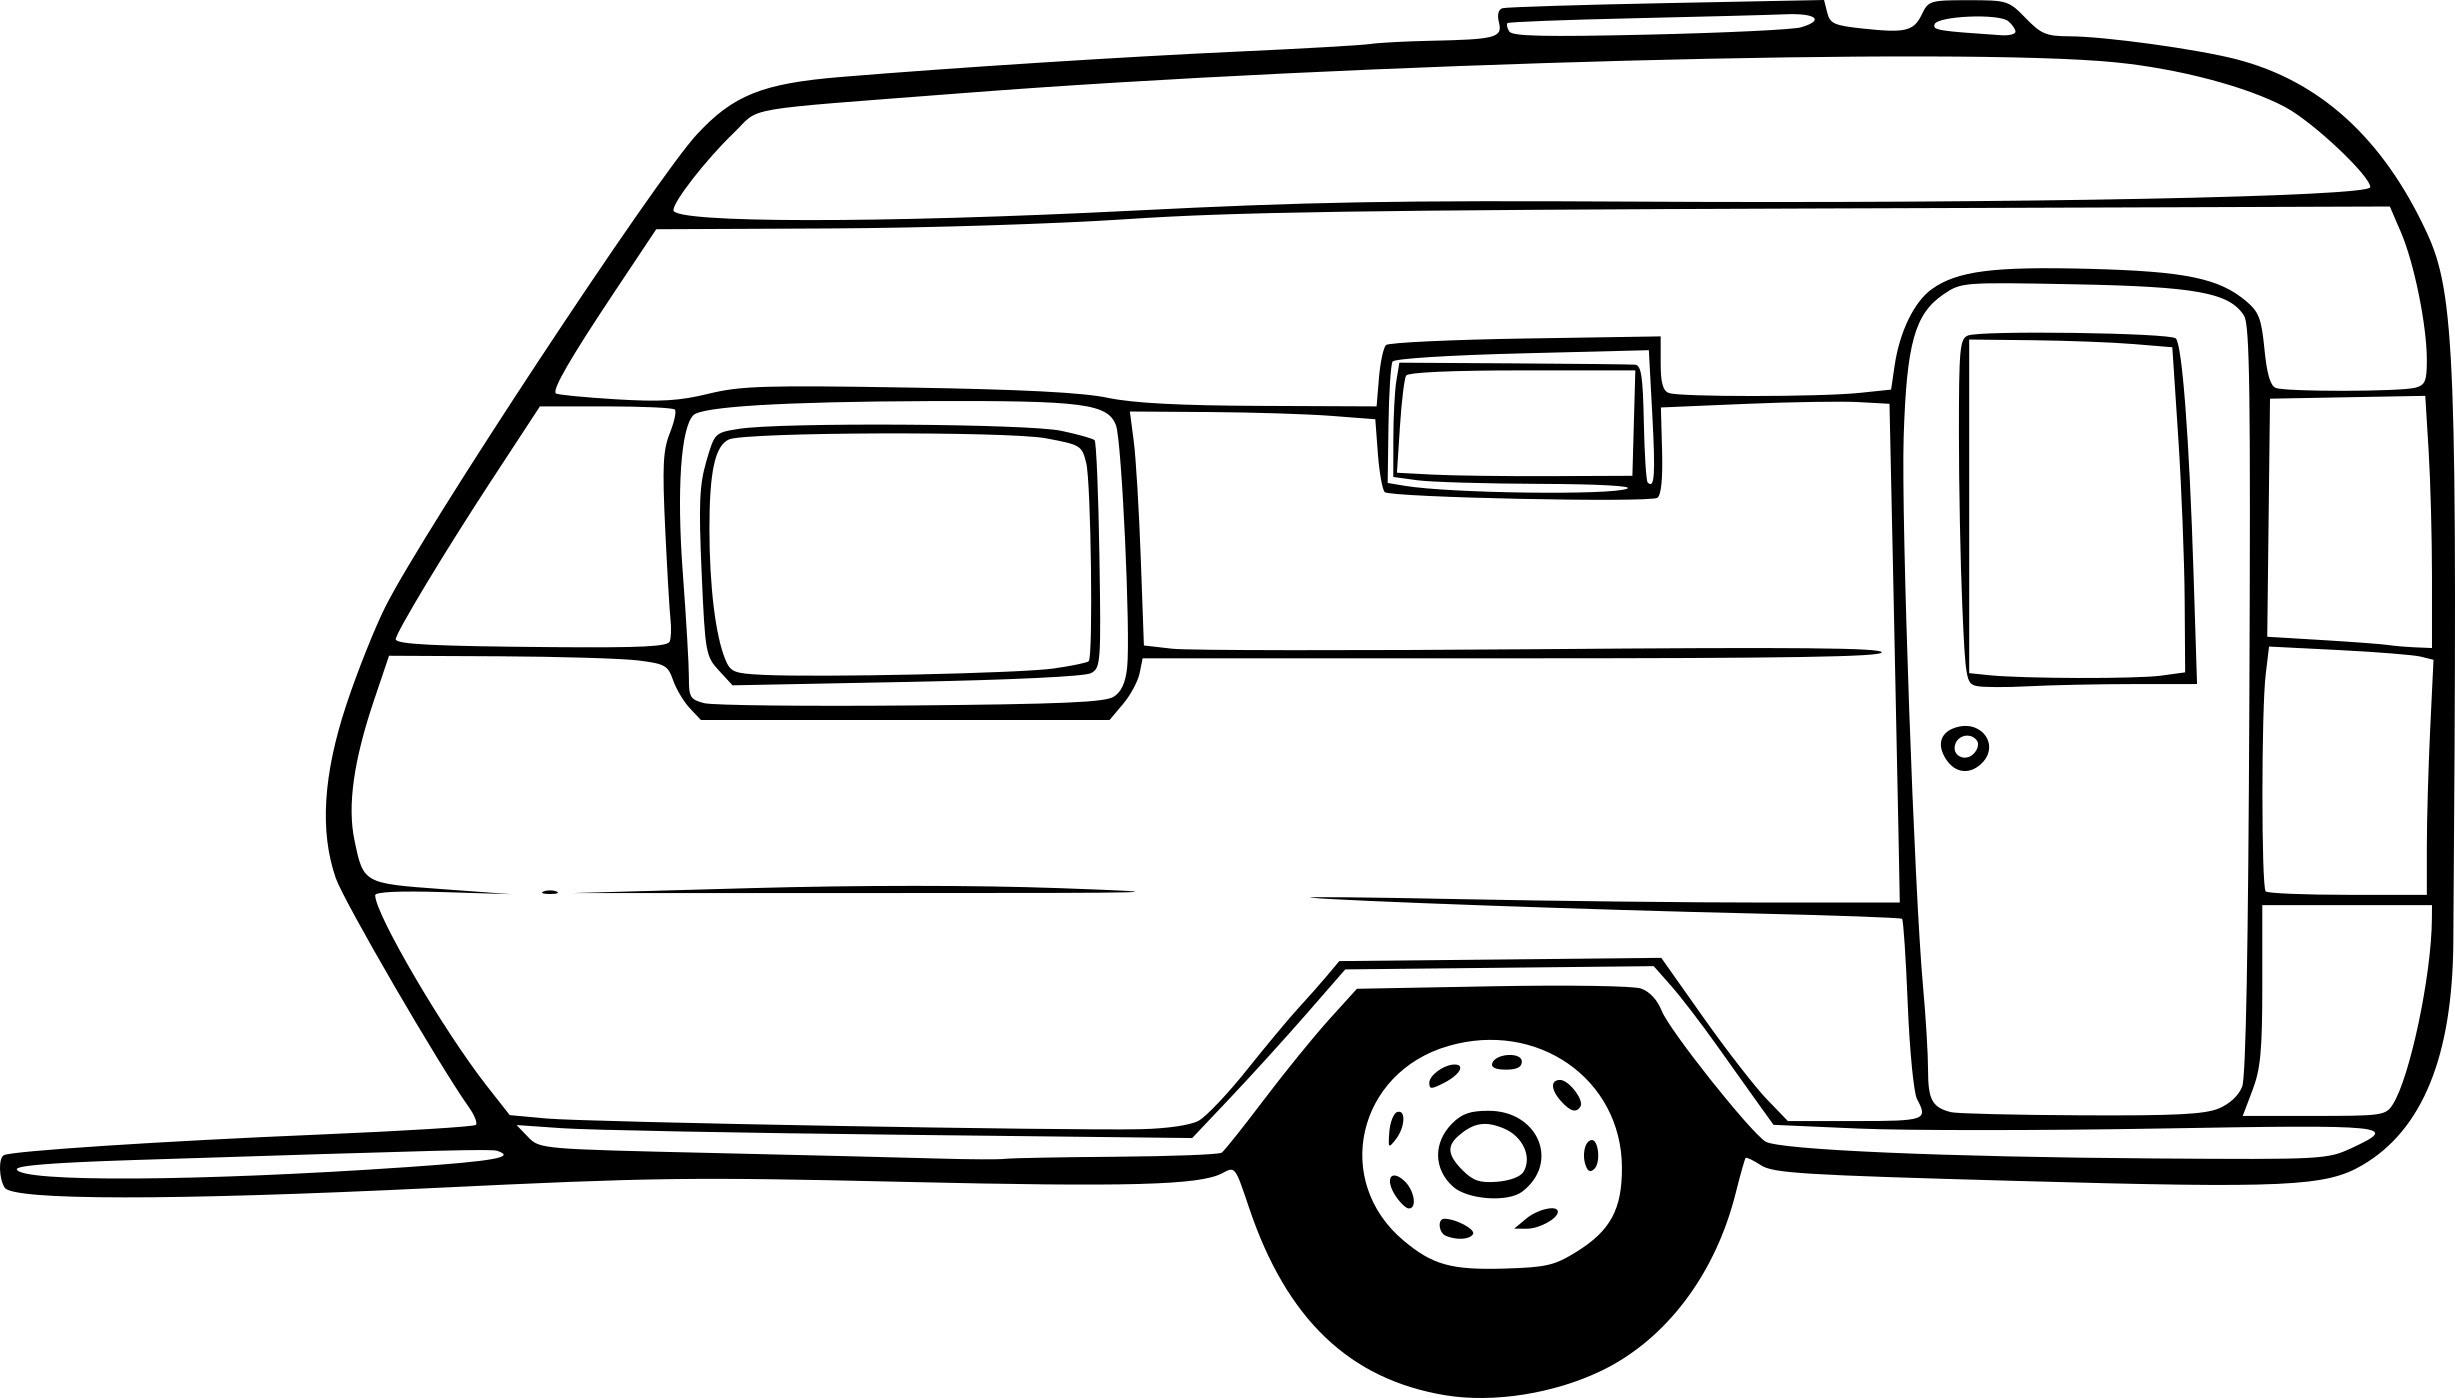 Coloriage caravane  imprimer · Coloriage tractopelle